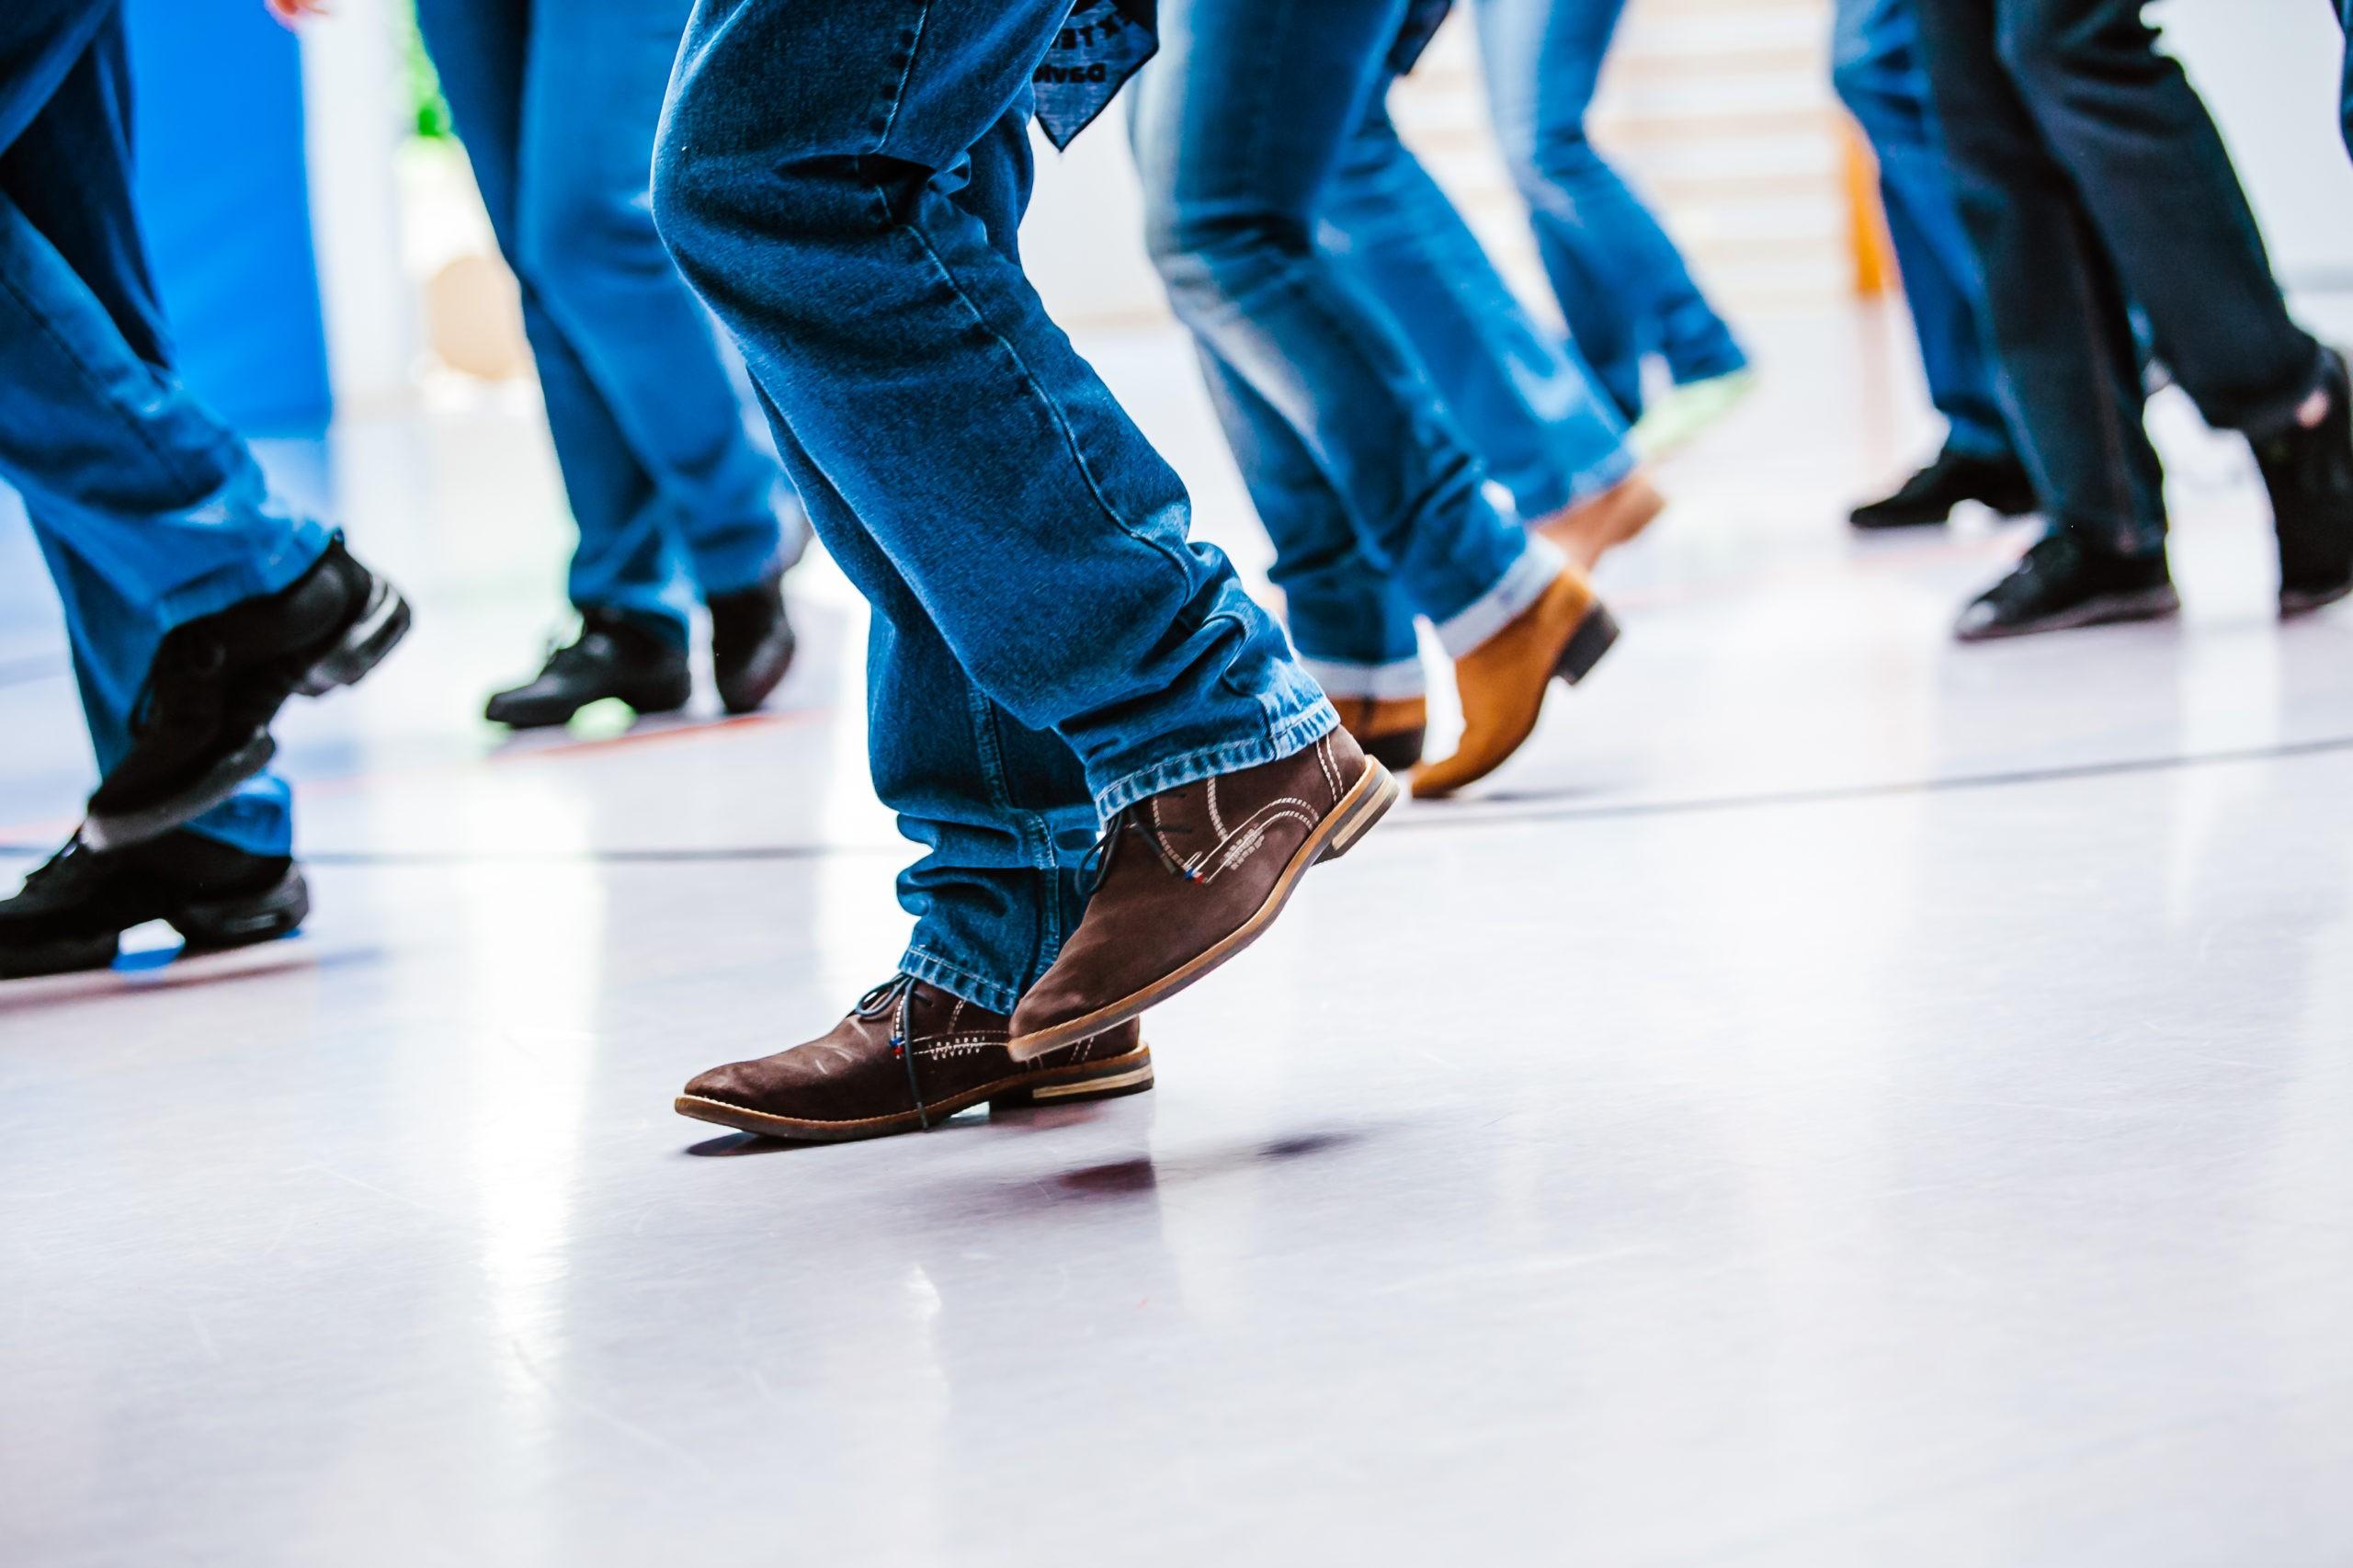 Linedance